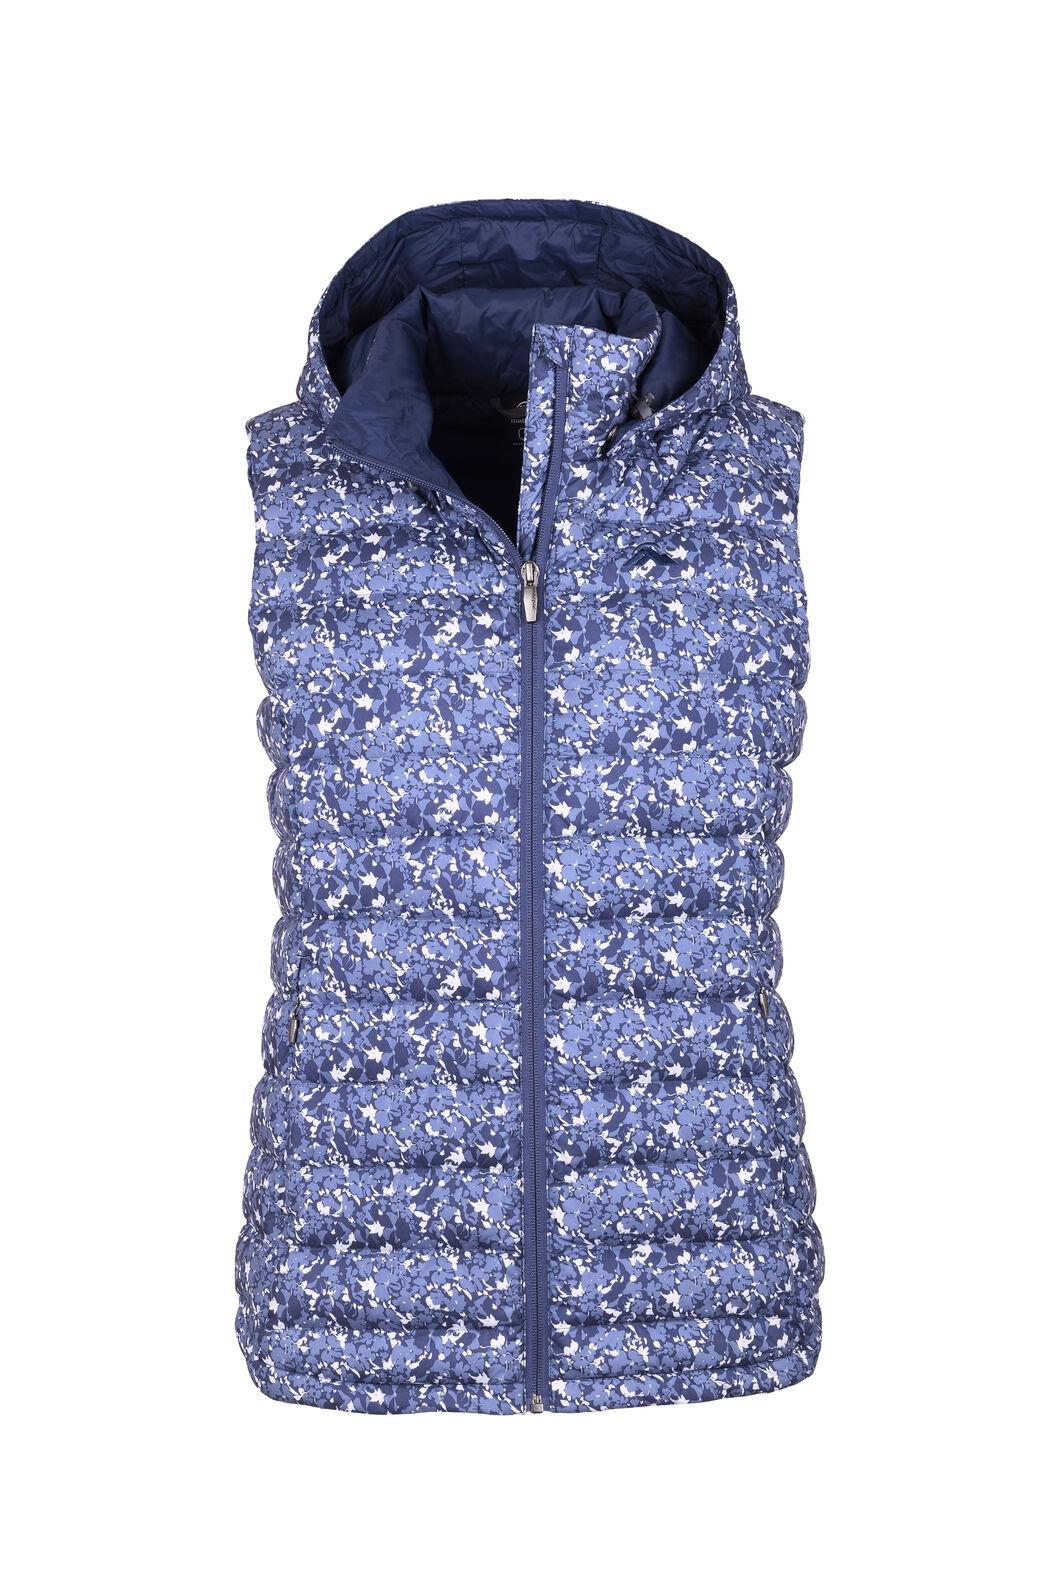 Macpac Women's Zodiac Hooded Down Vest, Mood Indigo/Pearl, hi-res